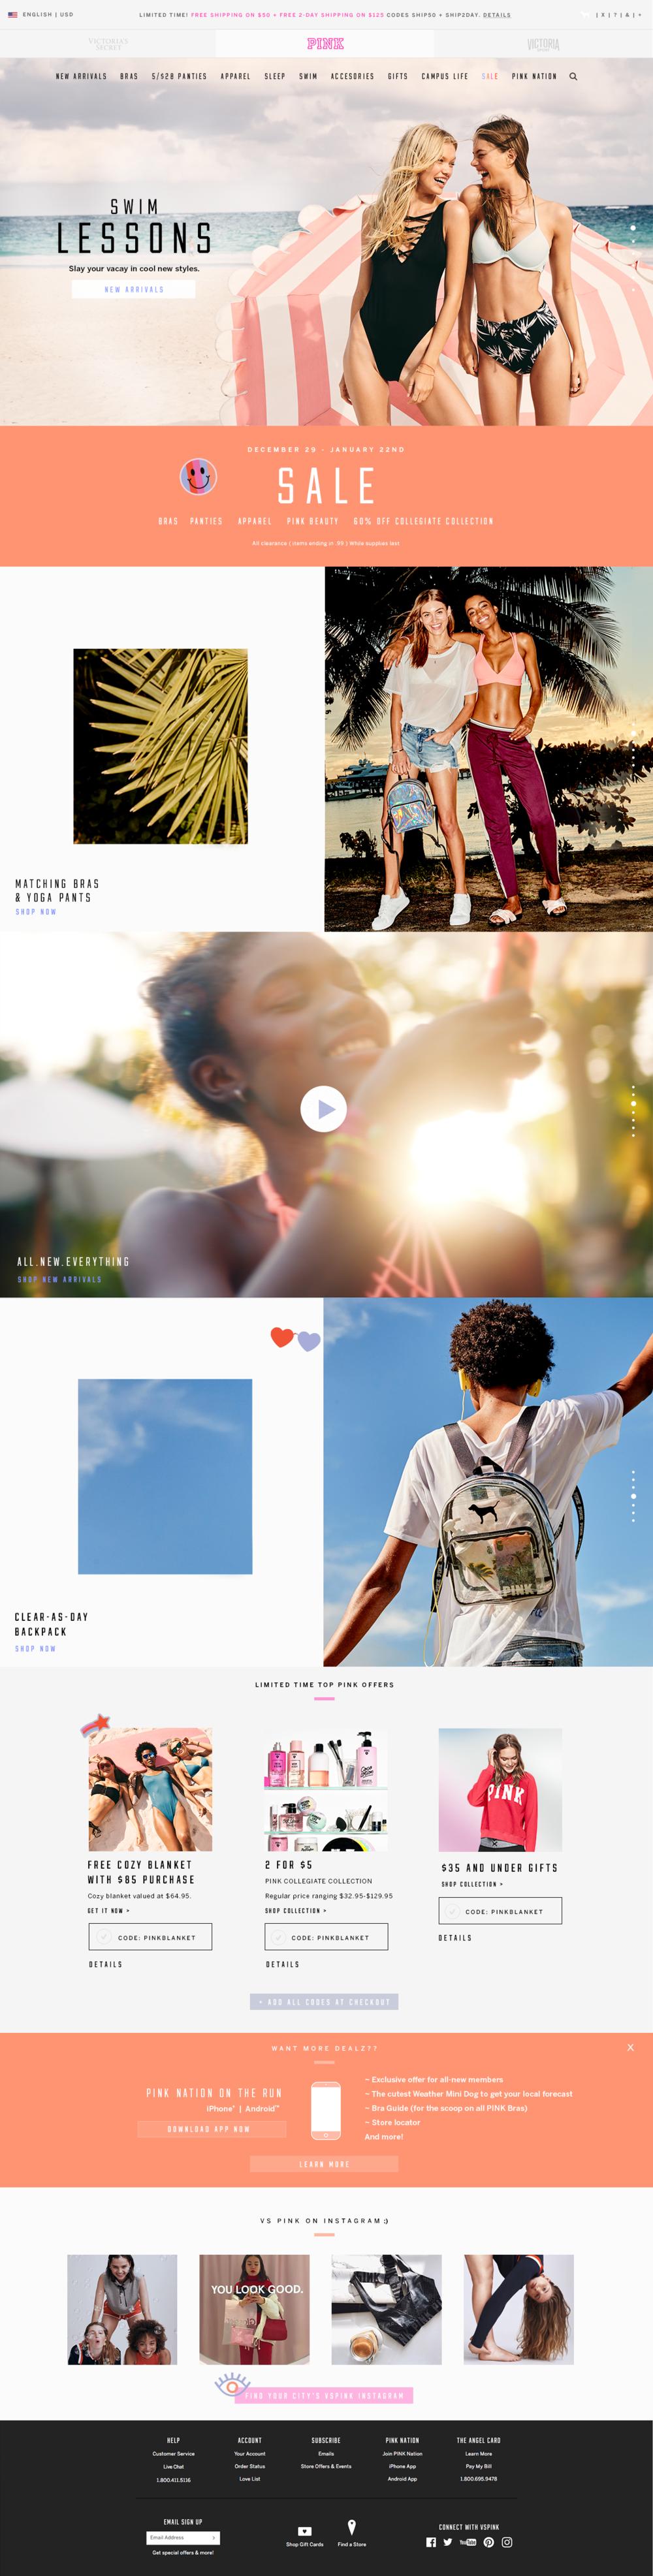 VS_Homepage.png